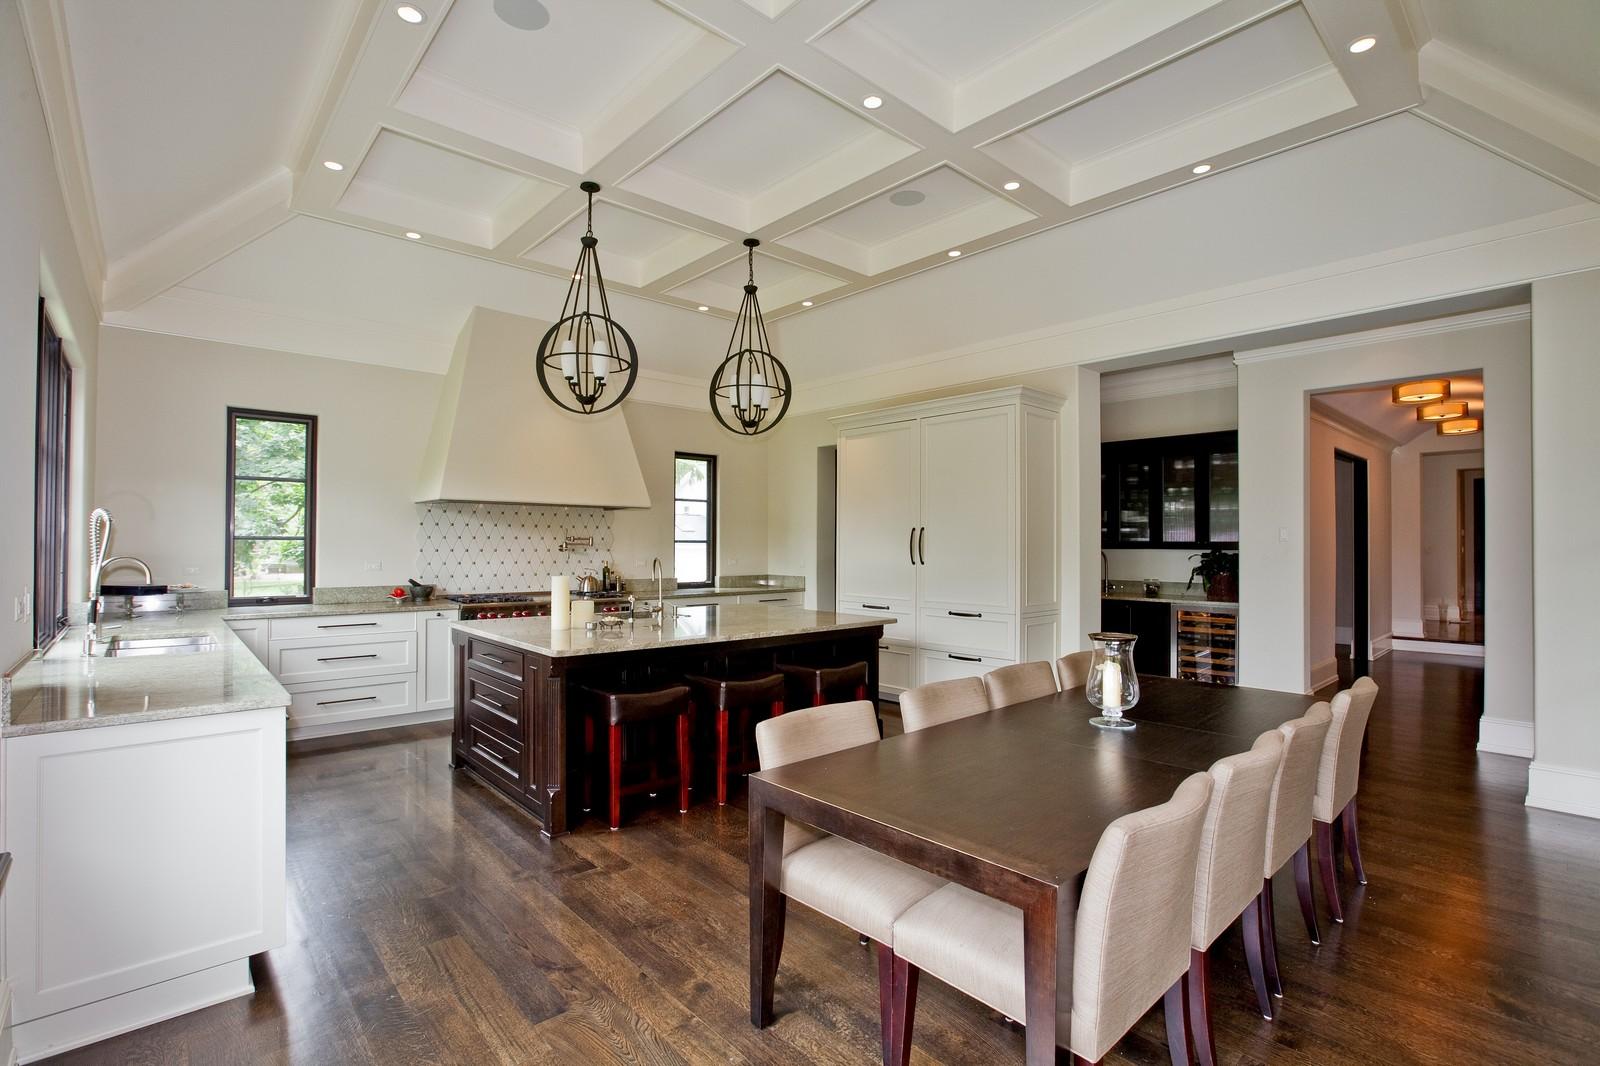 Real Estate Photography - 6143 Madison, Burr Ridge, IL, 60527 - Kitchen